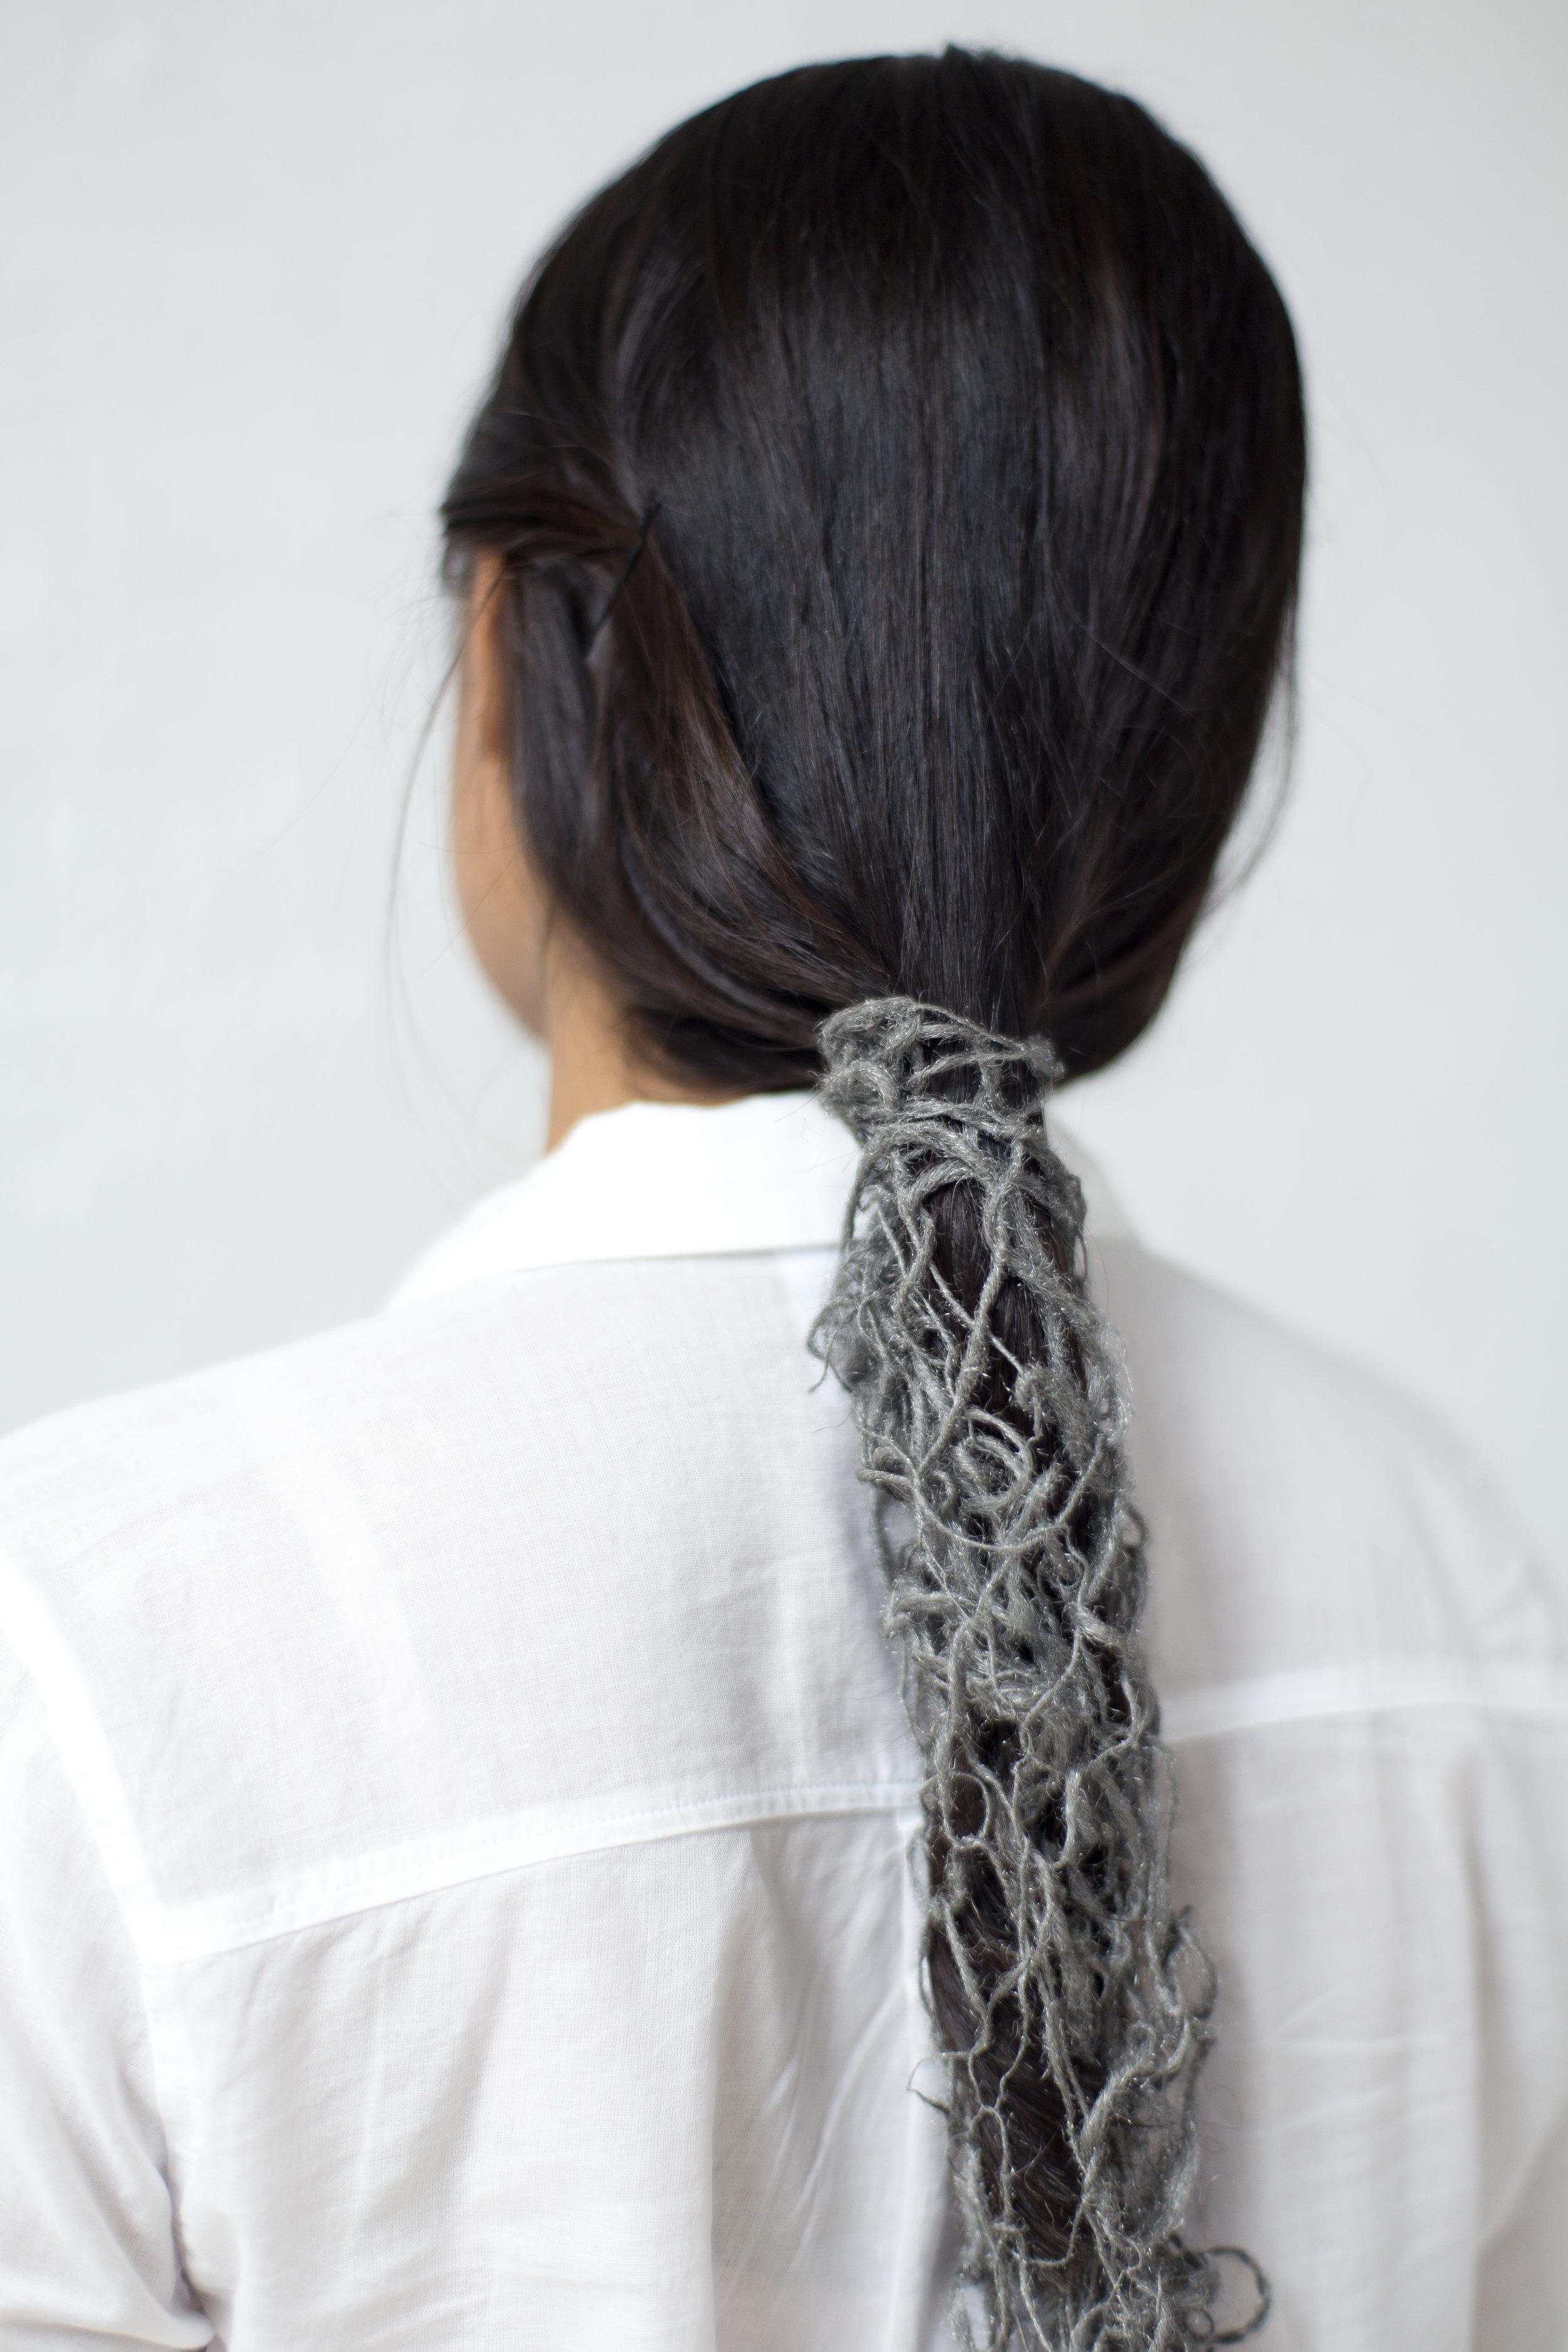 Hand-spun steel wool wrapped around Swati Kapur's hair